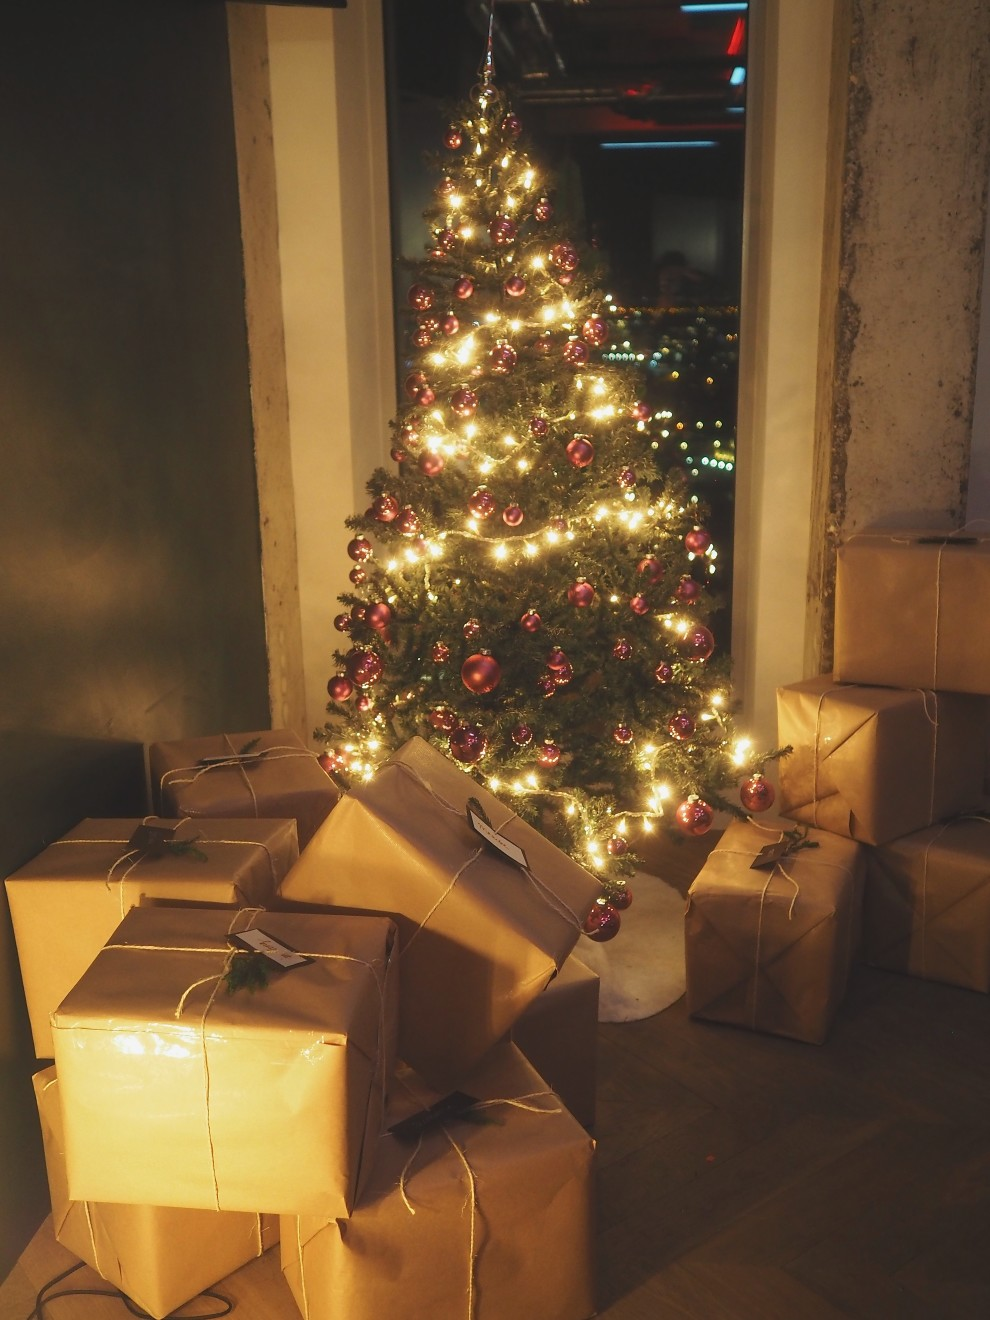 RIVER ISLAND CHRISTMAS + UNBOXING OOTD ADAM TOREN